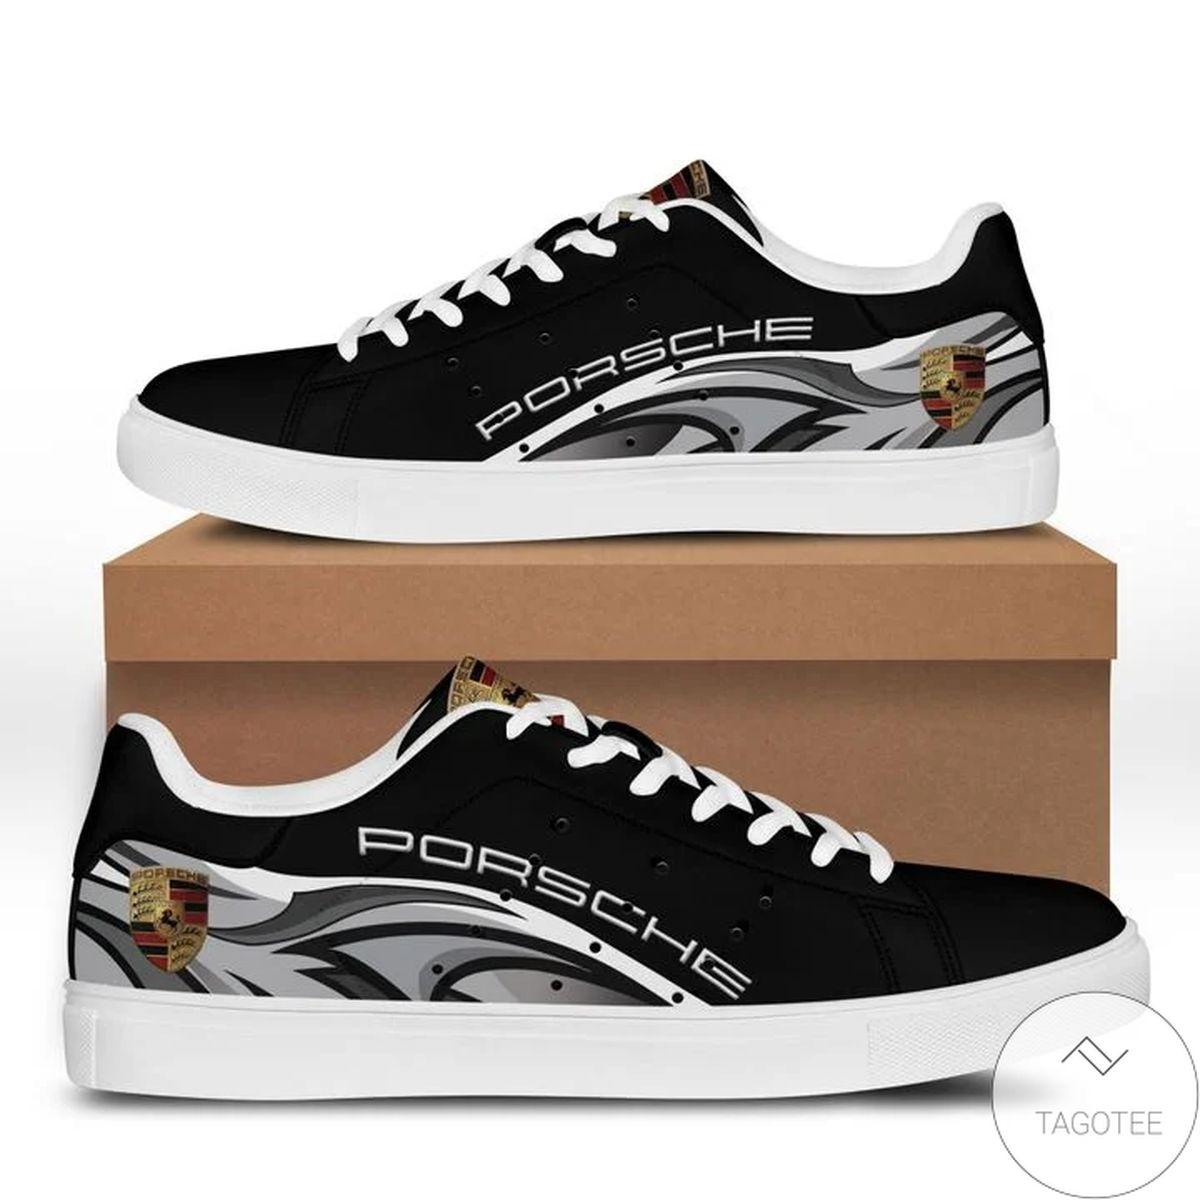 Discount Porsche Black Stan Smith Shoes